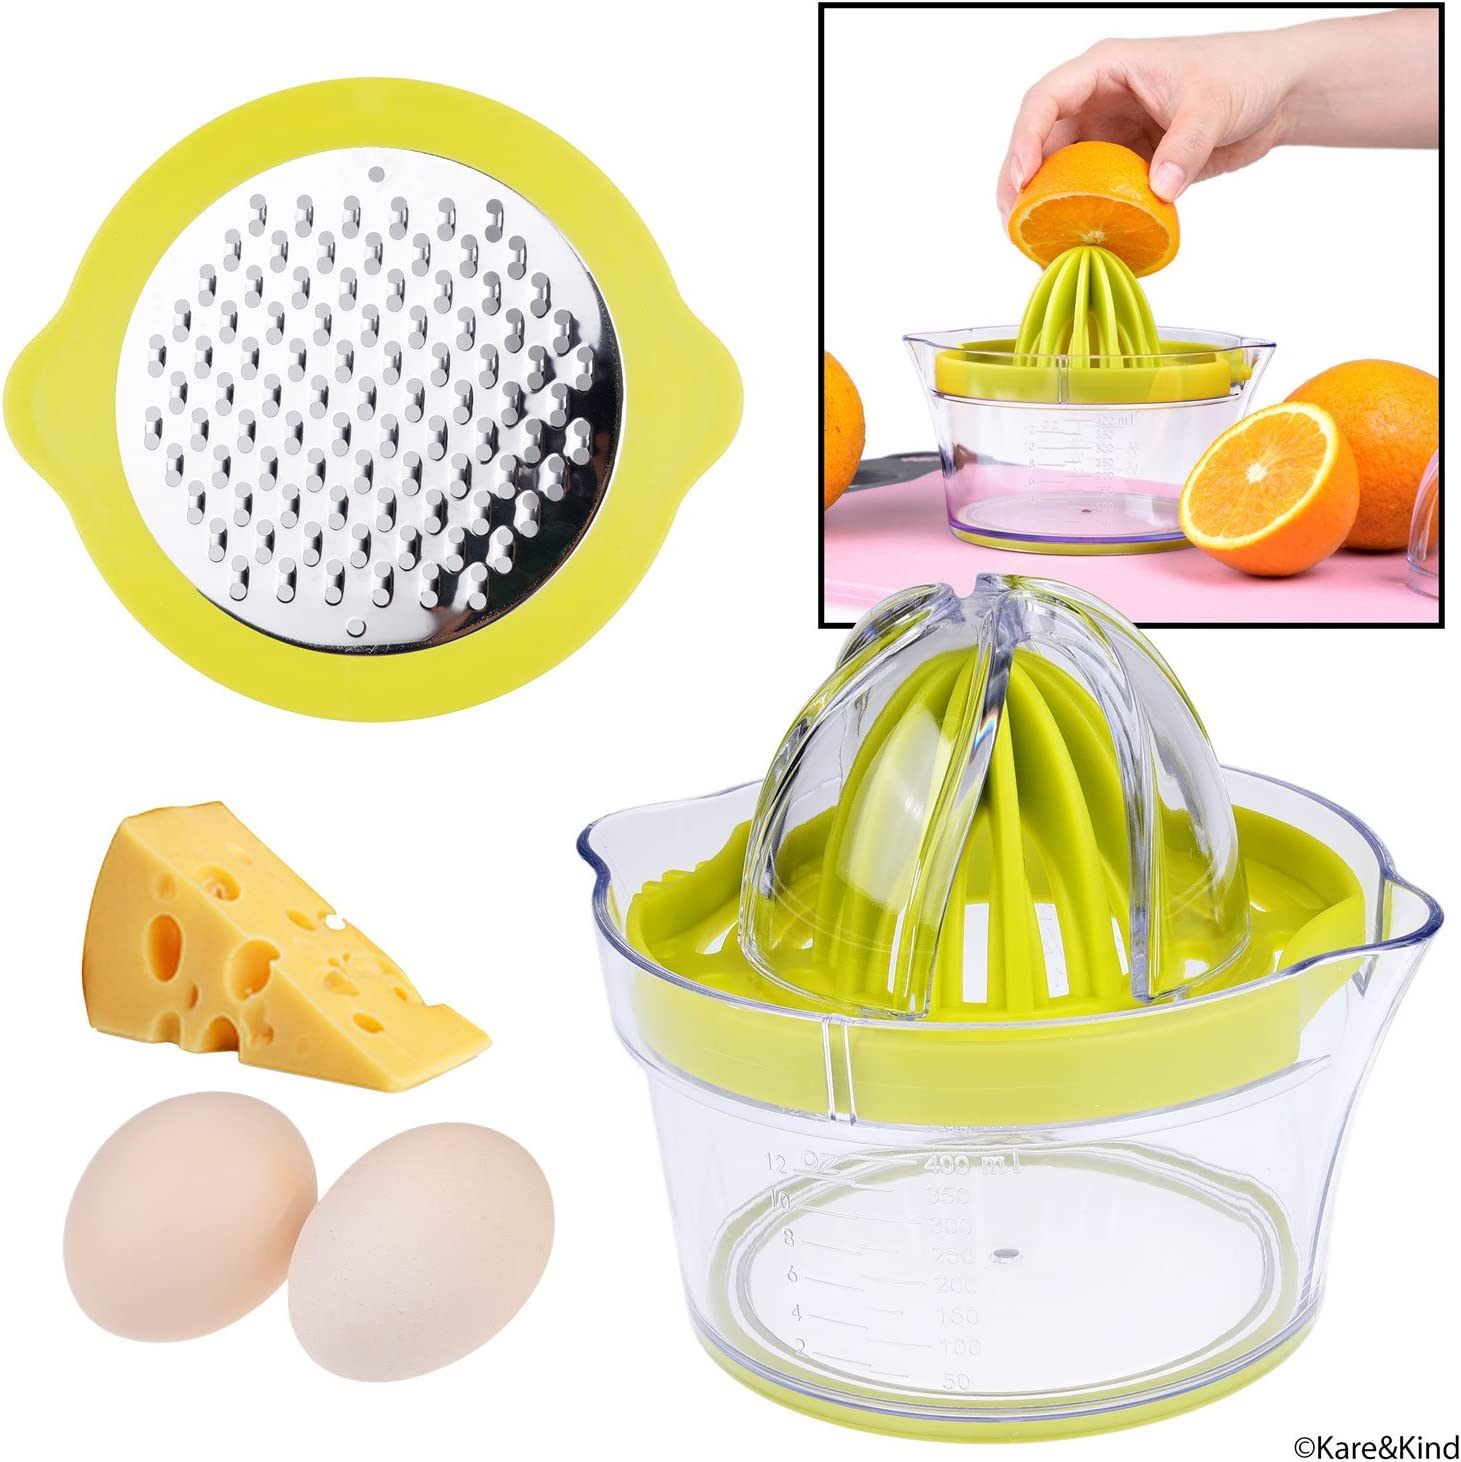 Citrus Juicer with Pulp Filter, Fruit/Vegetable/Chocolate Grater, Measuring Bowl, Egg Yolk Separator - Space Saving Design - Non Slip Silicone Bottom - Dishwasher Safe - No Electricity, No Noise